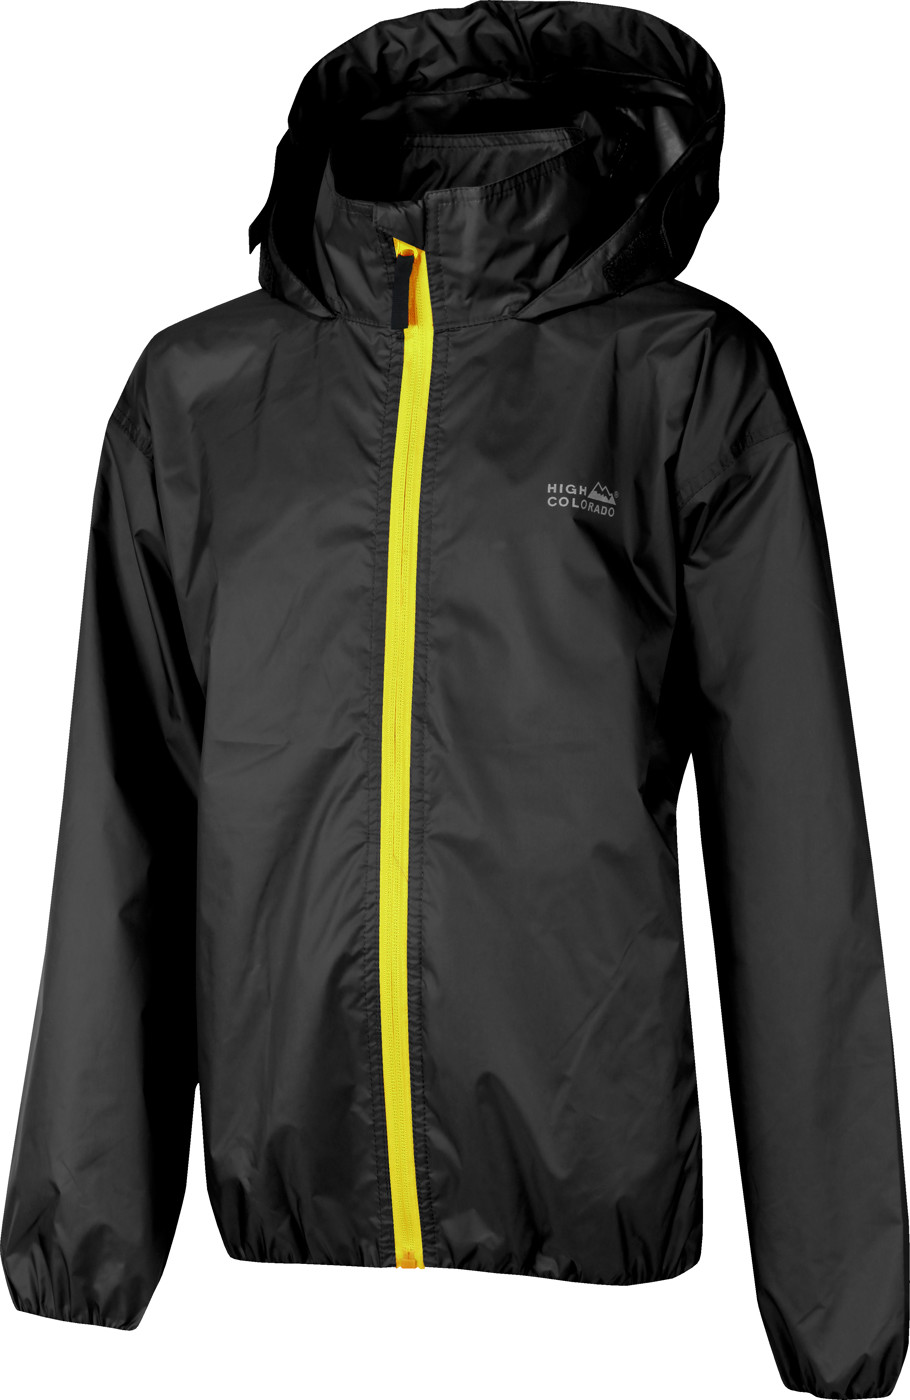 HIGH COLORADO  rain jacket CANNES-K - Kinder